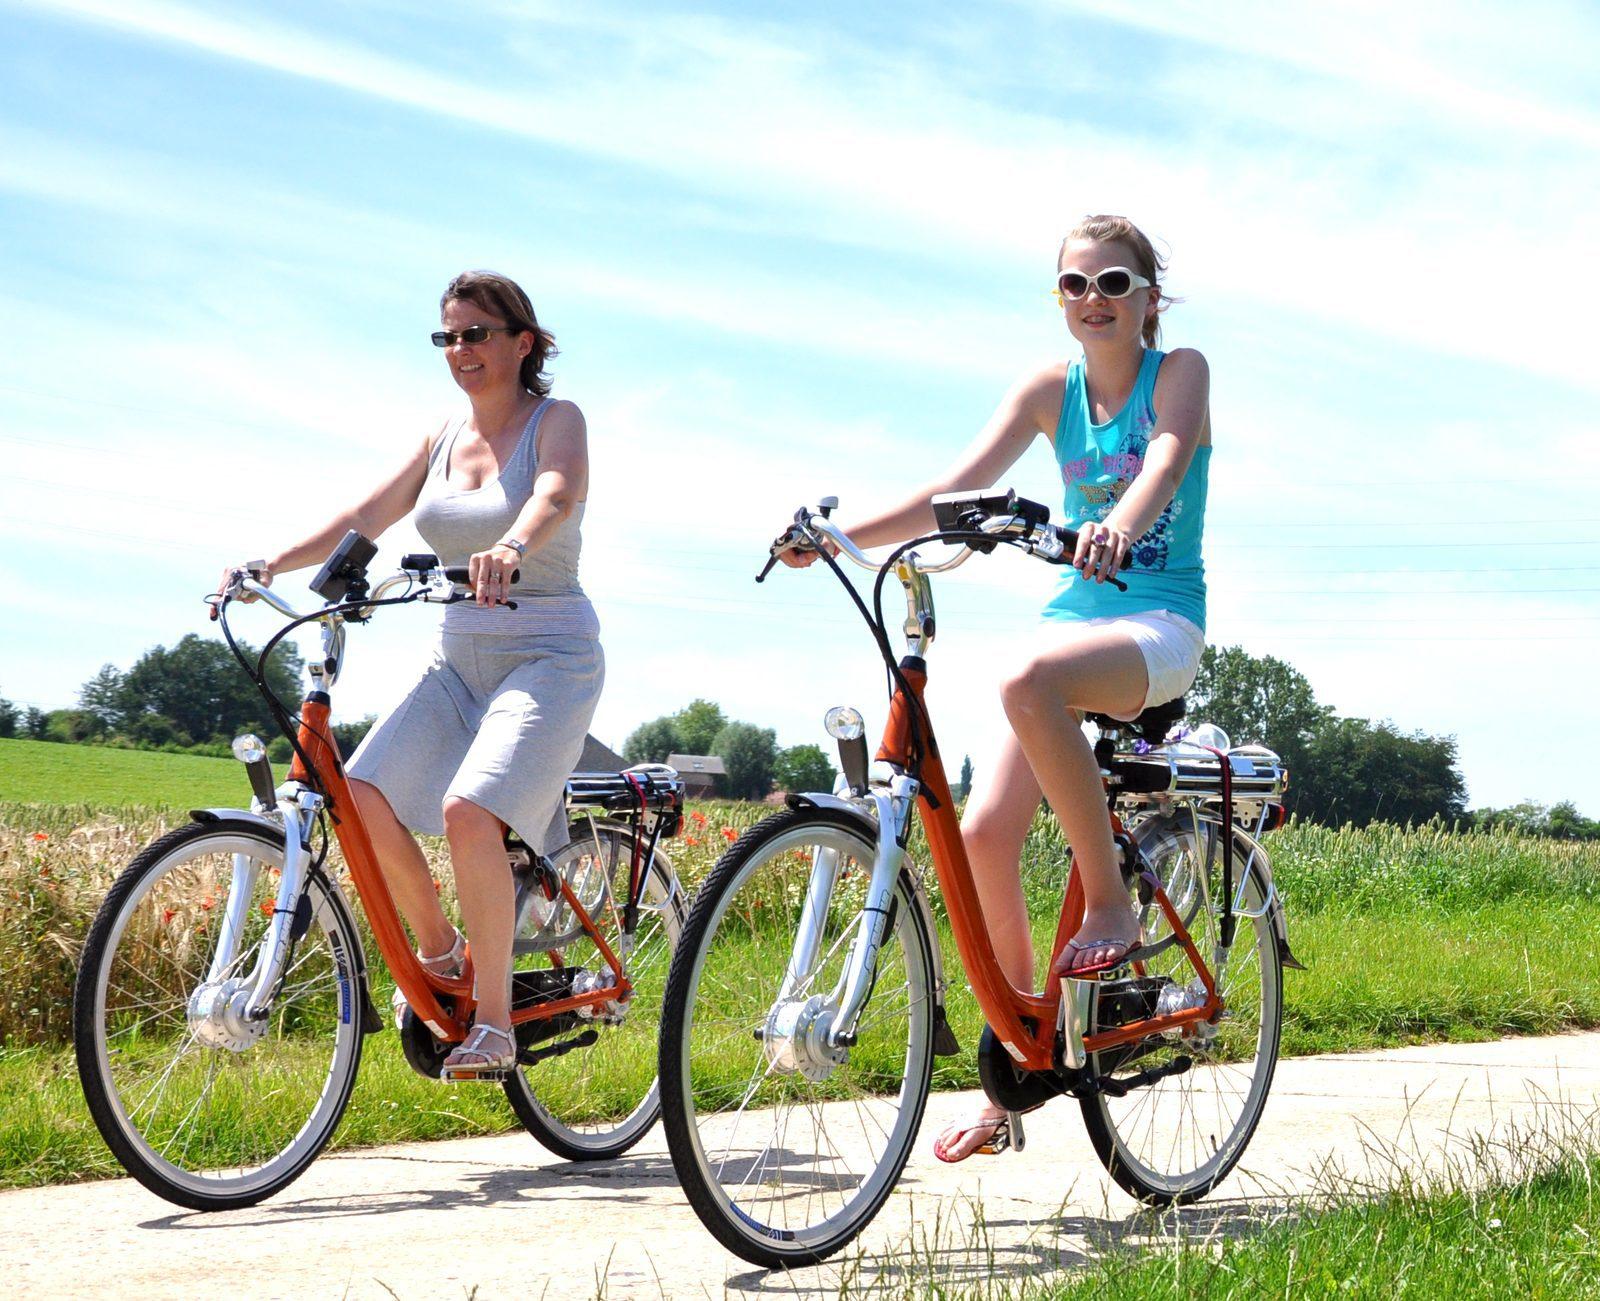 Biking in Giethoorn